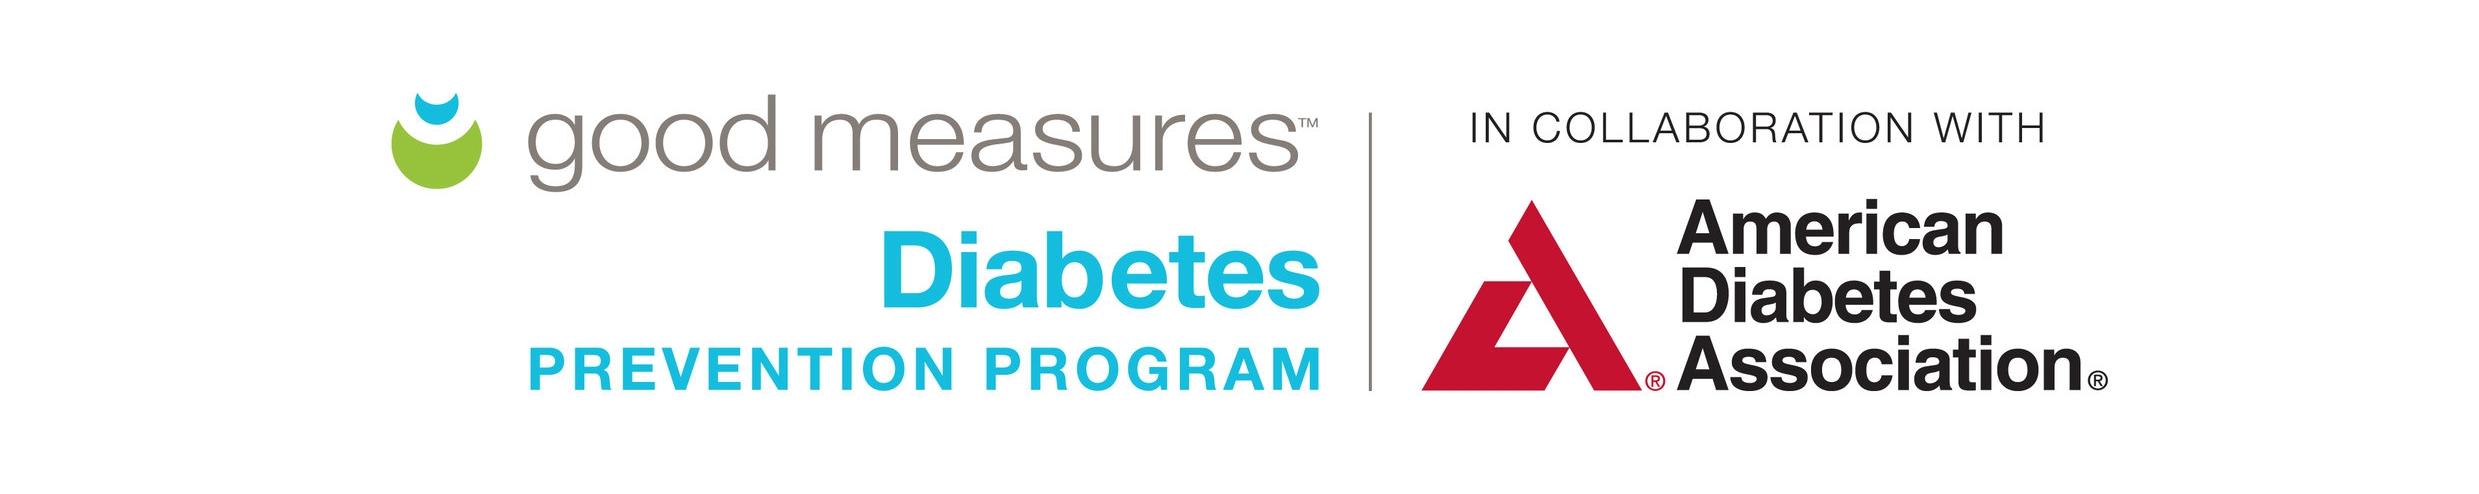 Horizontal Good Measures with ADA Diabetes Prevention Program Logos.jpg